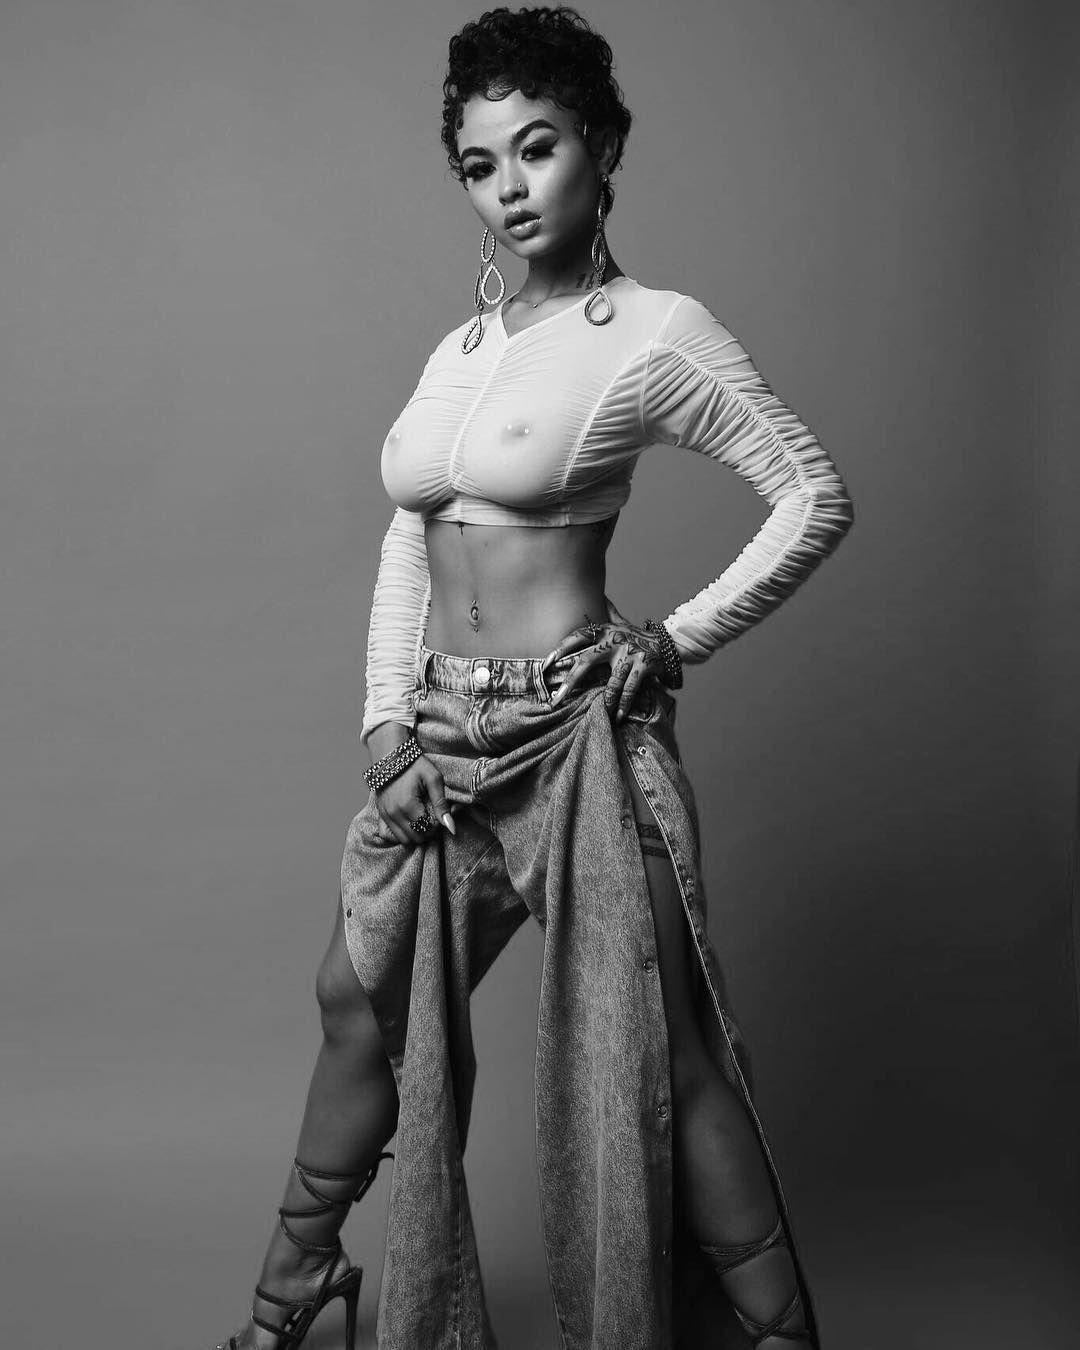 Emily blunt nude,Demi Lovato Latina Magazine, June/July 2016 Erotic video Isabella farrell nude photos,Alessandra Torresani See Through. 2018-2019 celebrityes photos leaks!